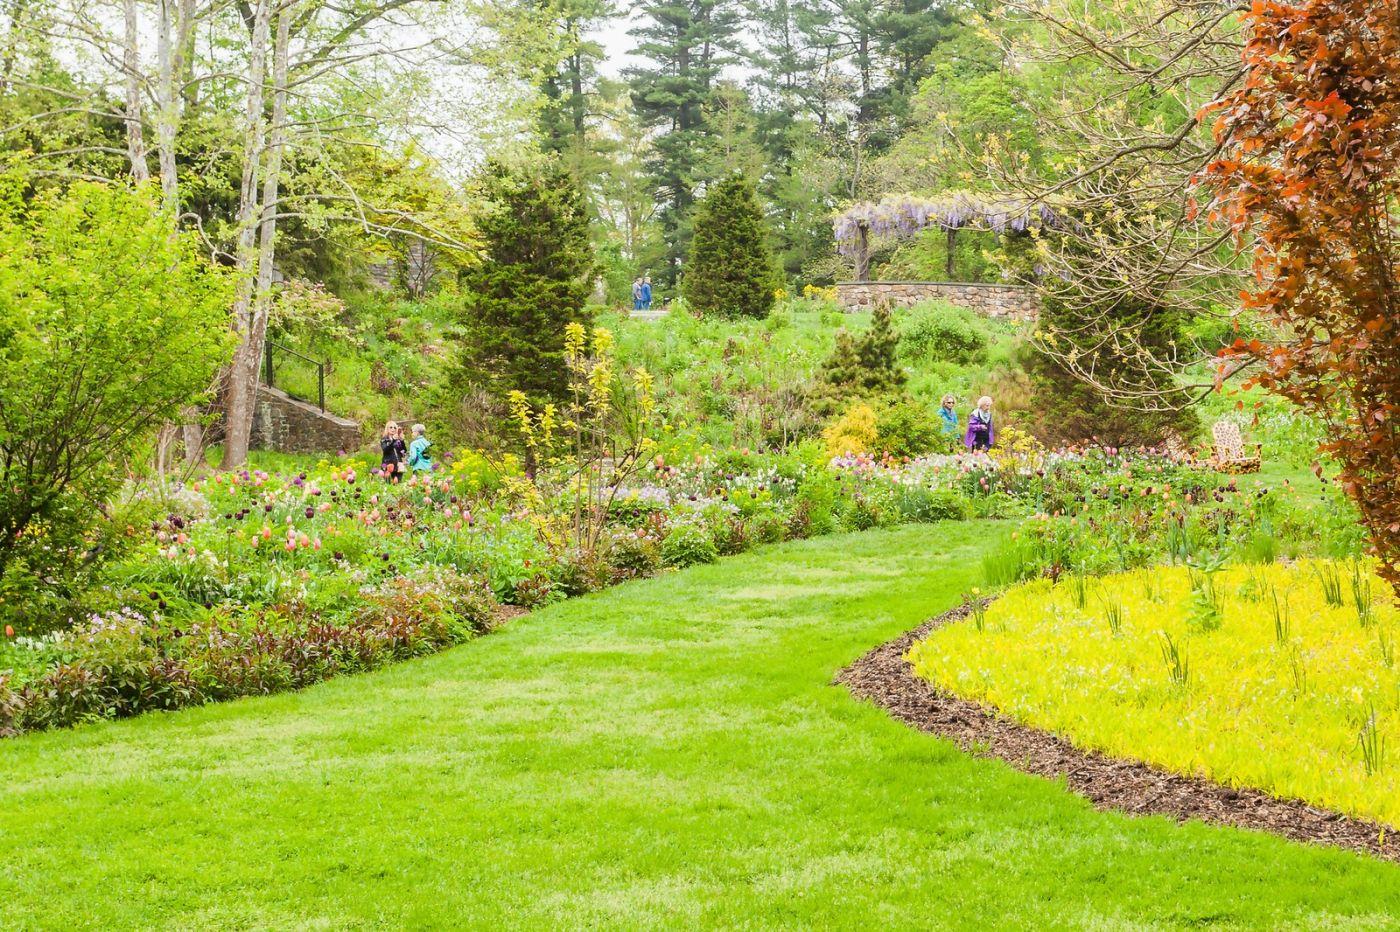 Chanticleer花园,融入自然_图1-37